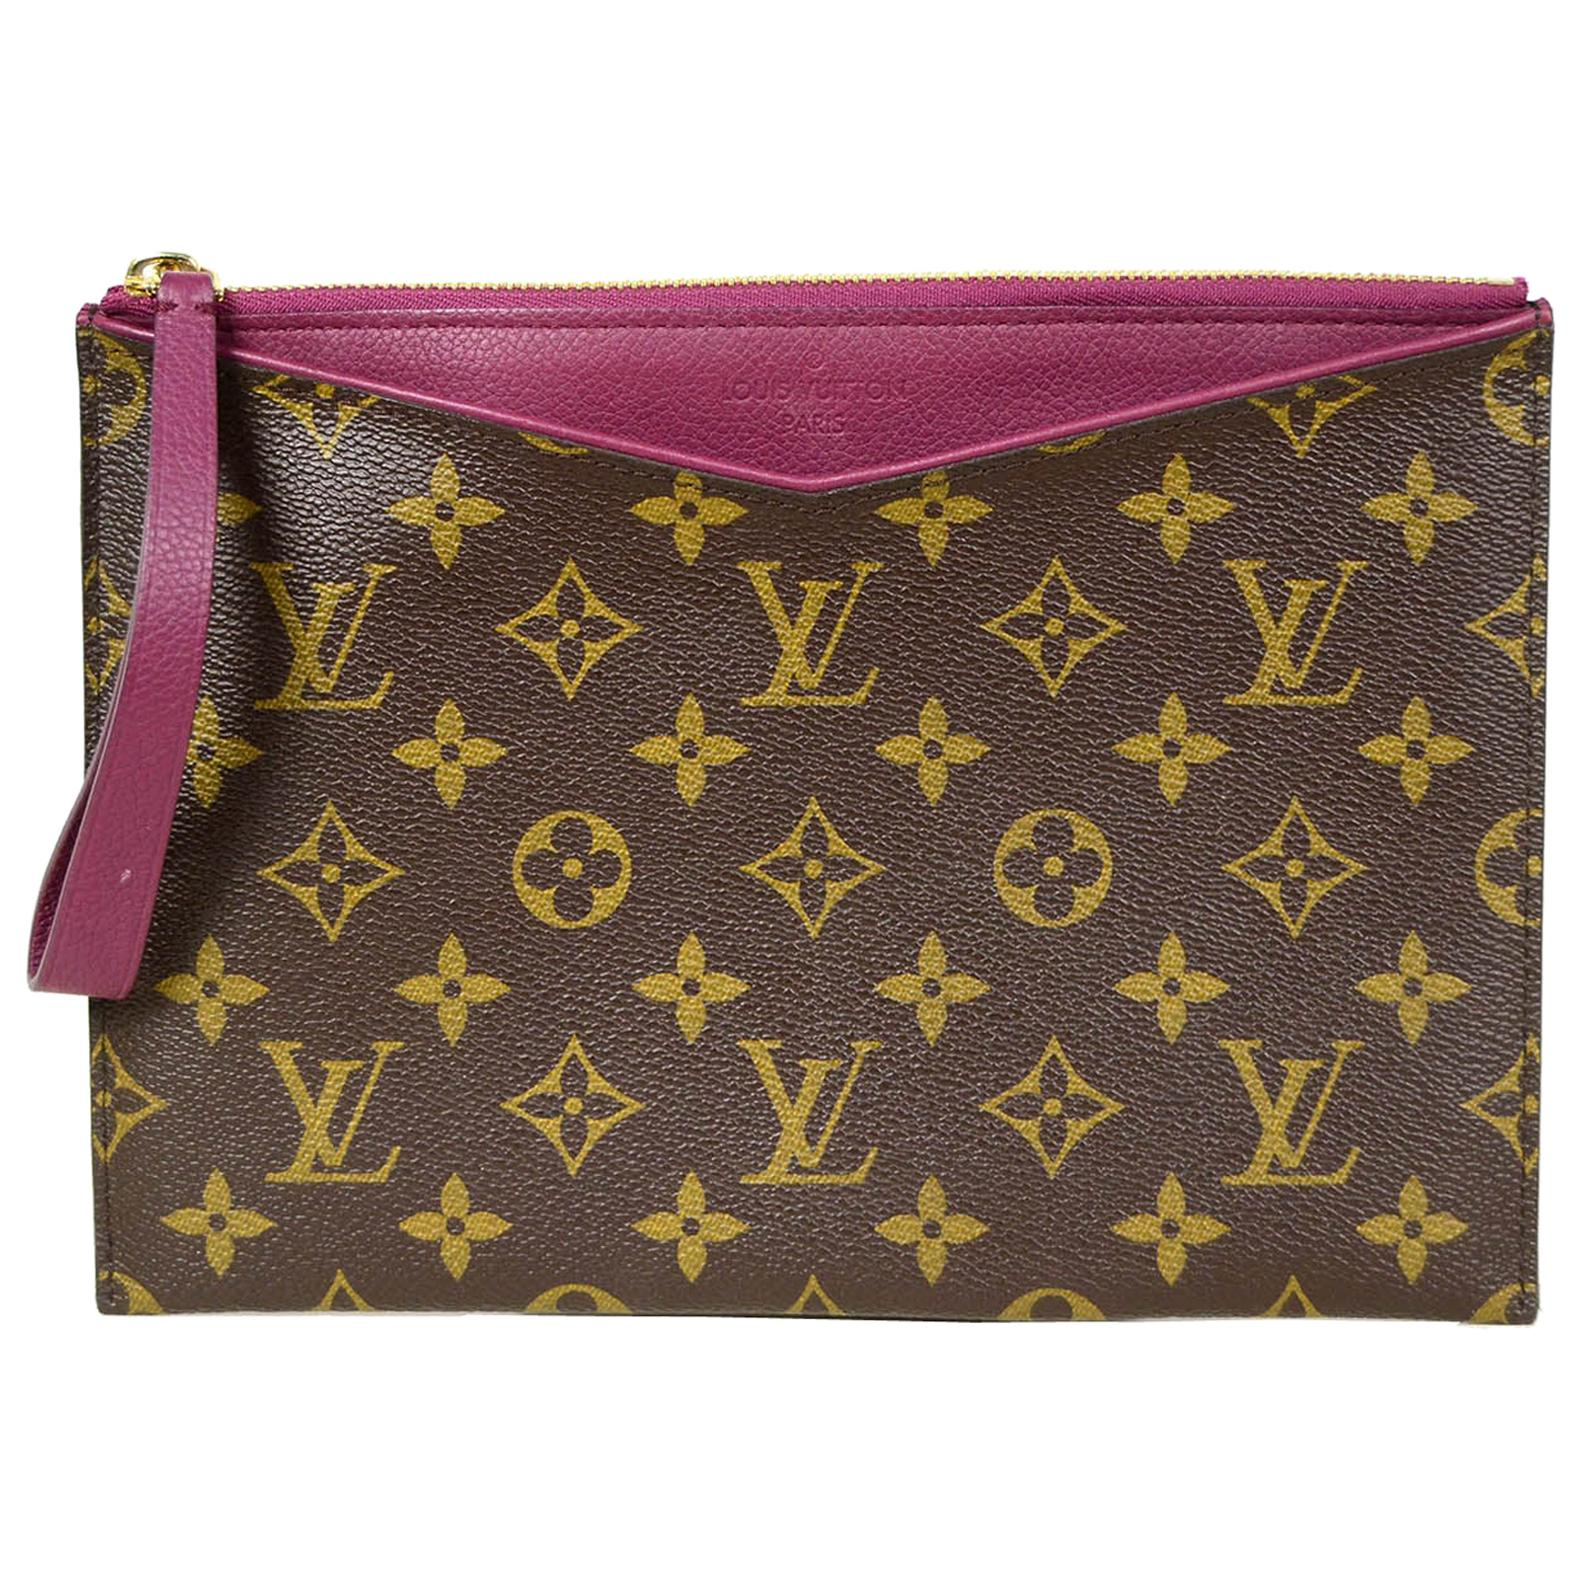 Louis Vuitton Monogram/Grape Pochette Pallas Wristlet Bag